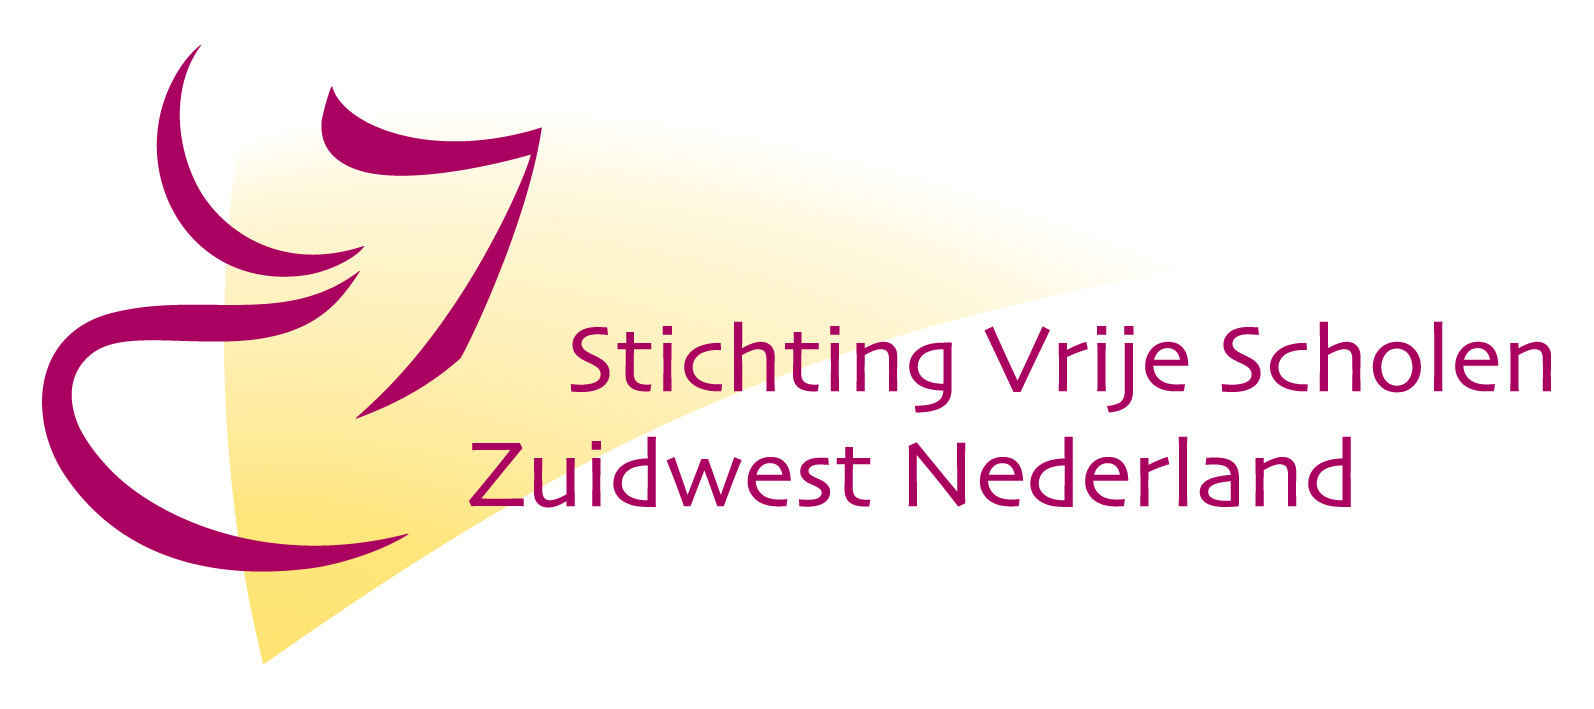 Stichting Vrijescholen Zuidwest Nederland